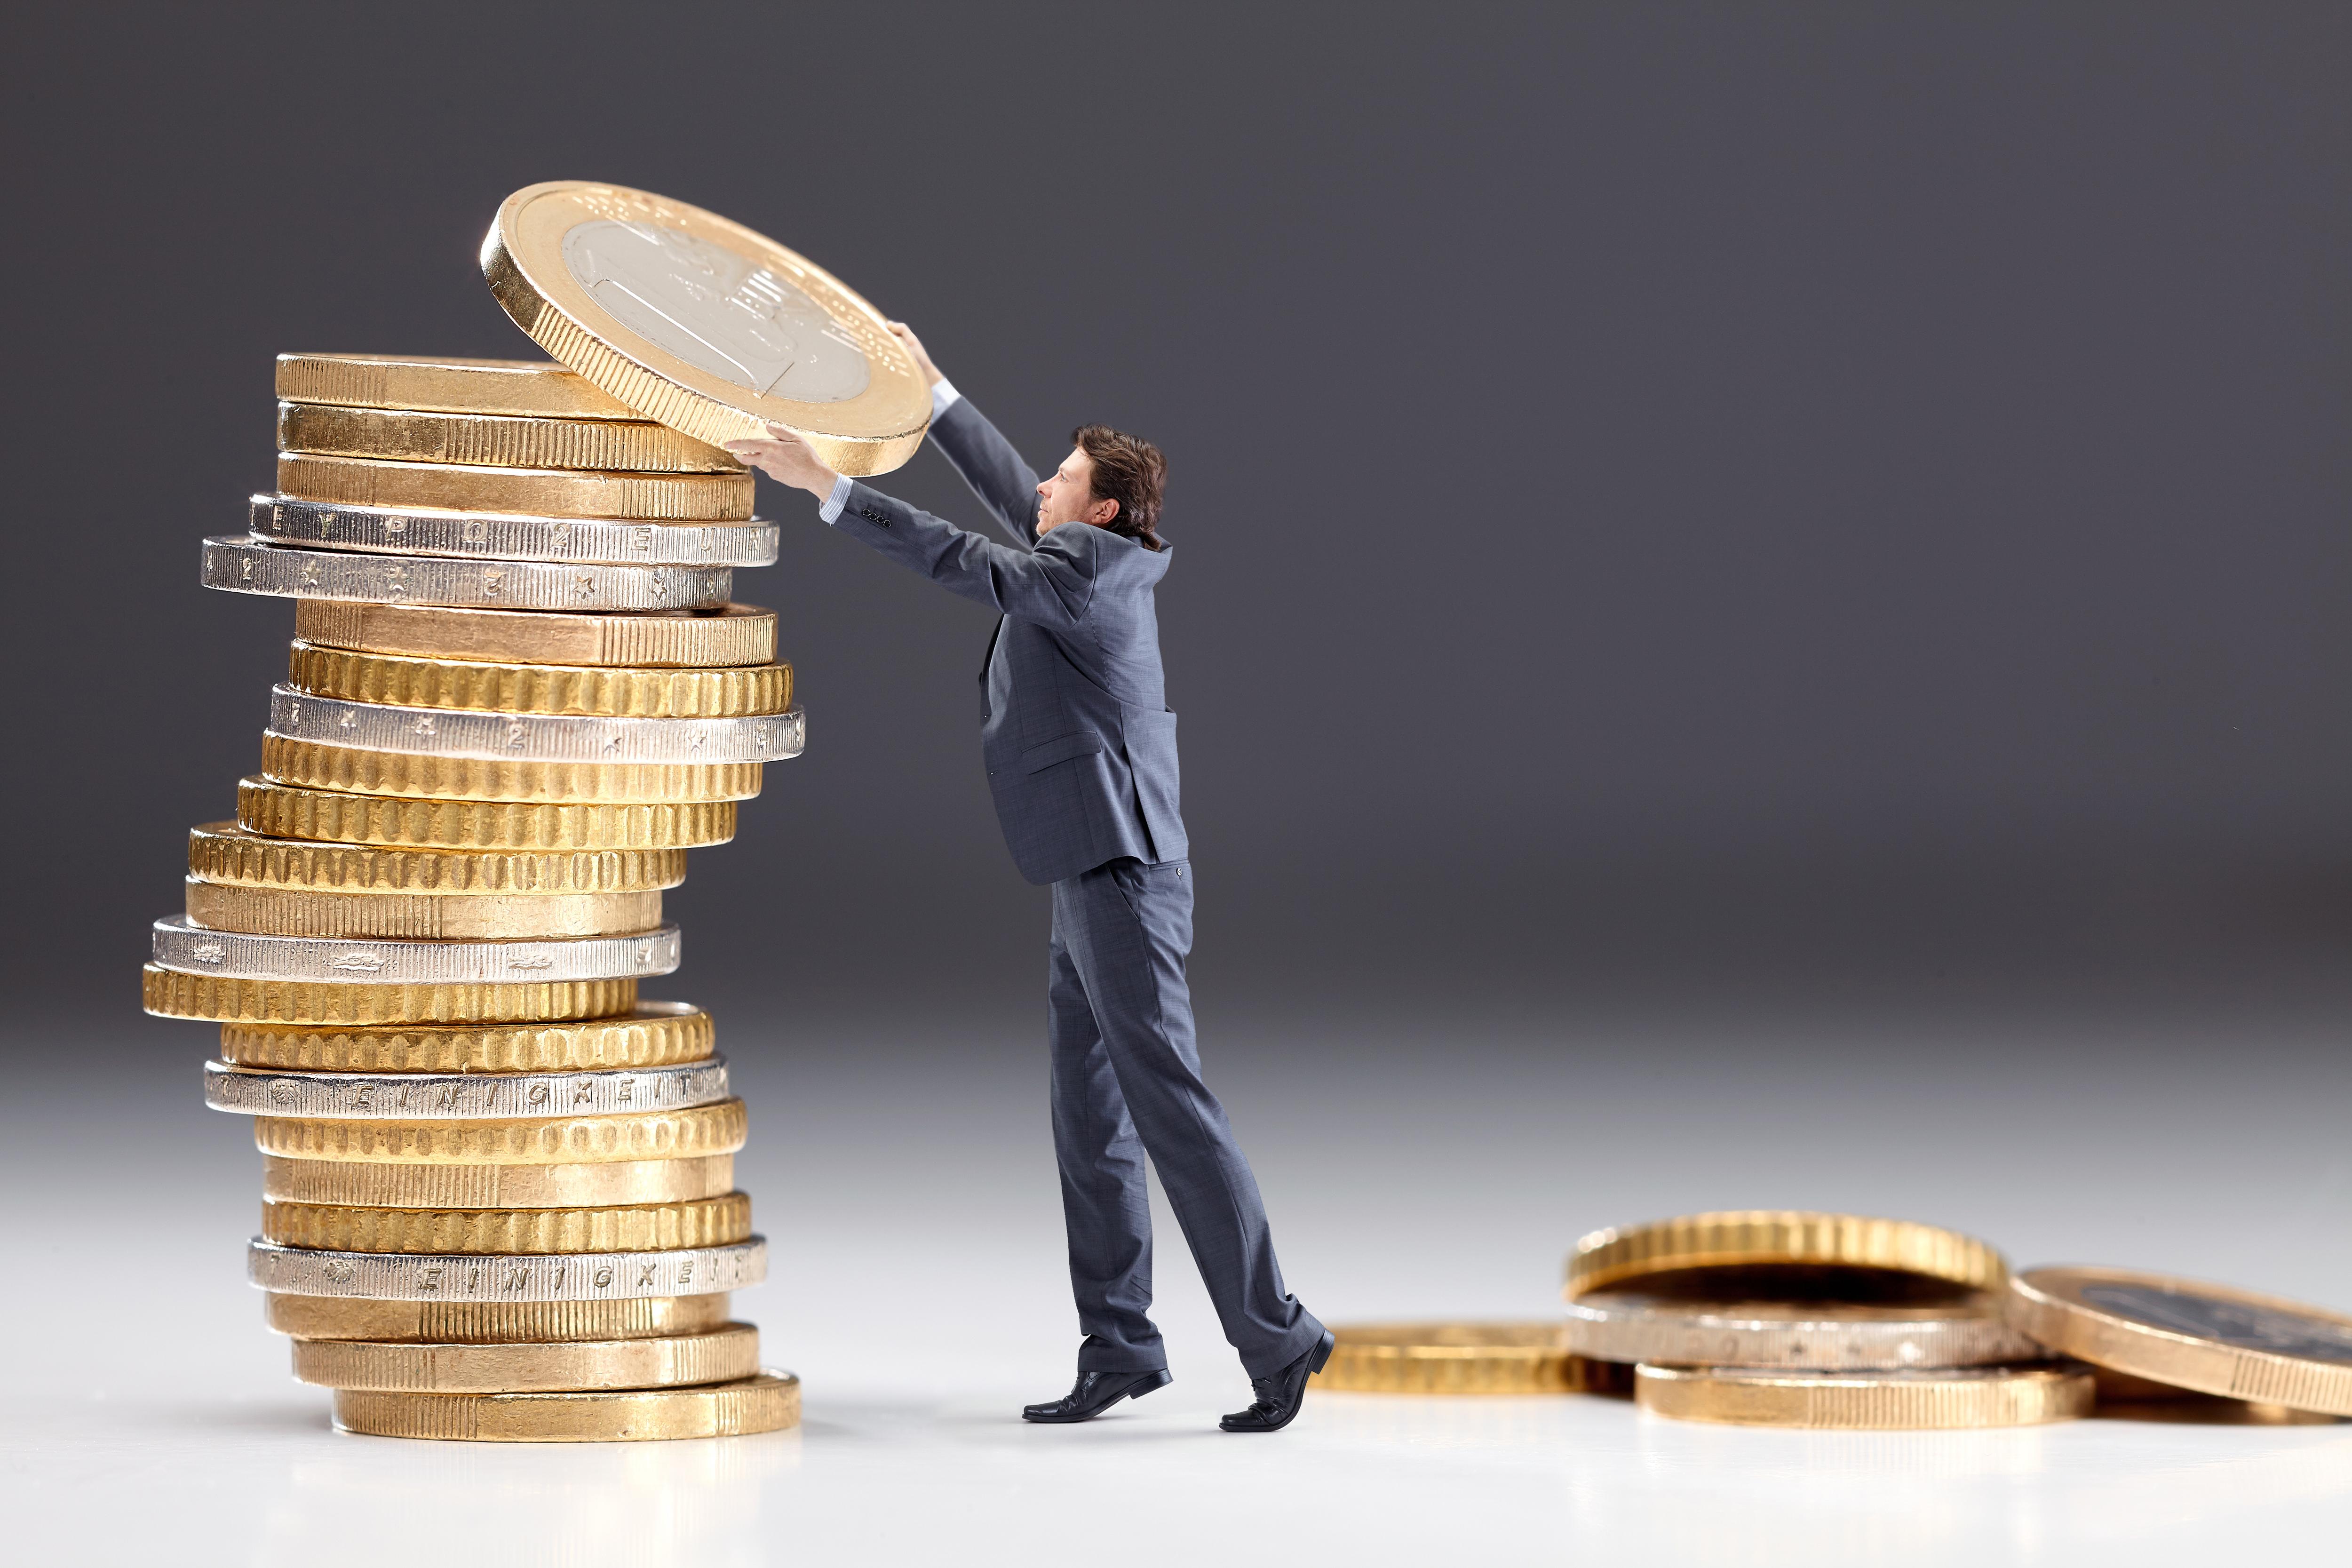 Man legt übergroße Münze auf Münzstapel